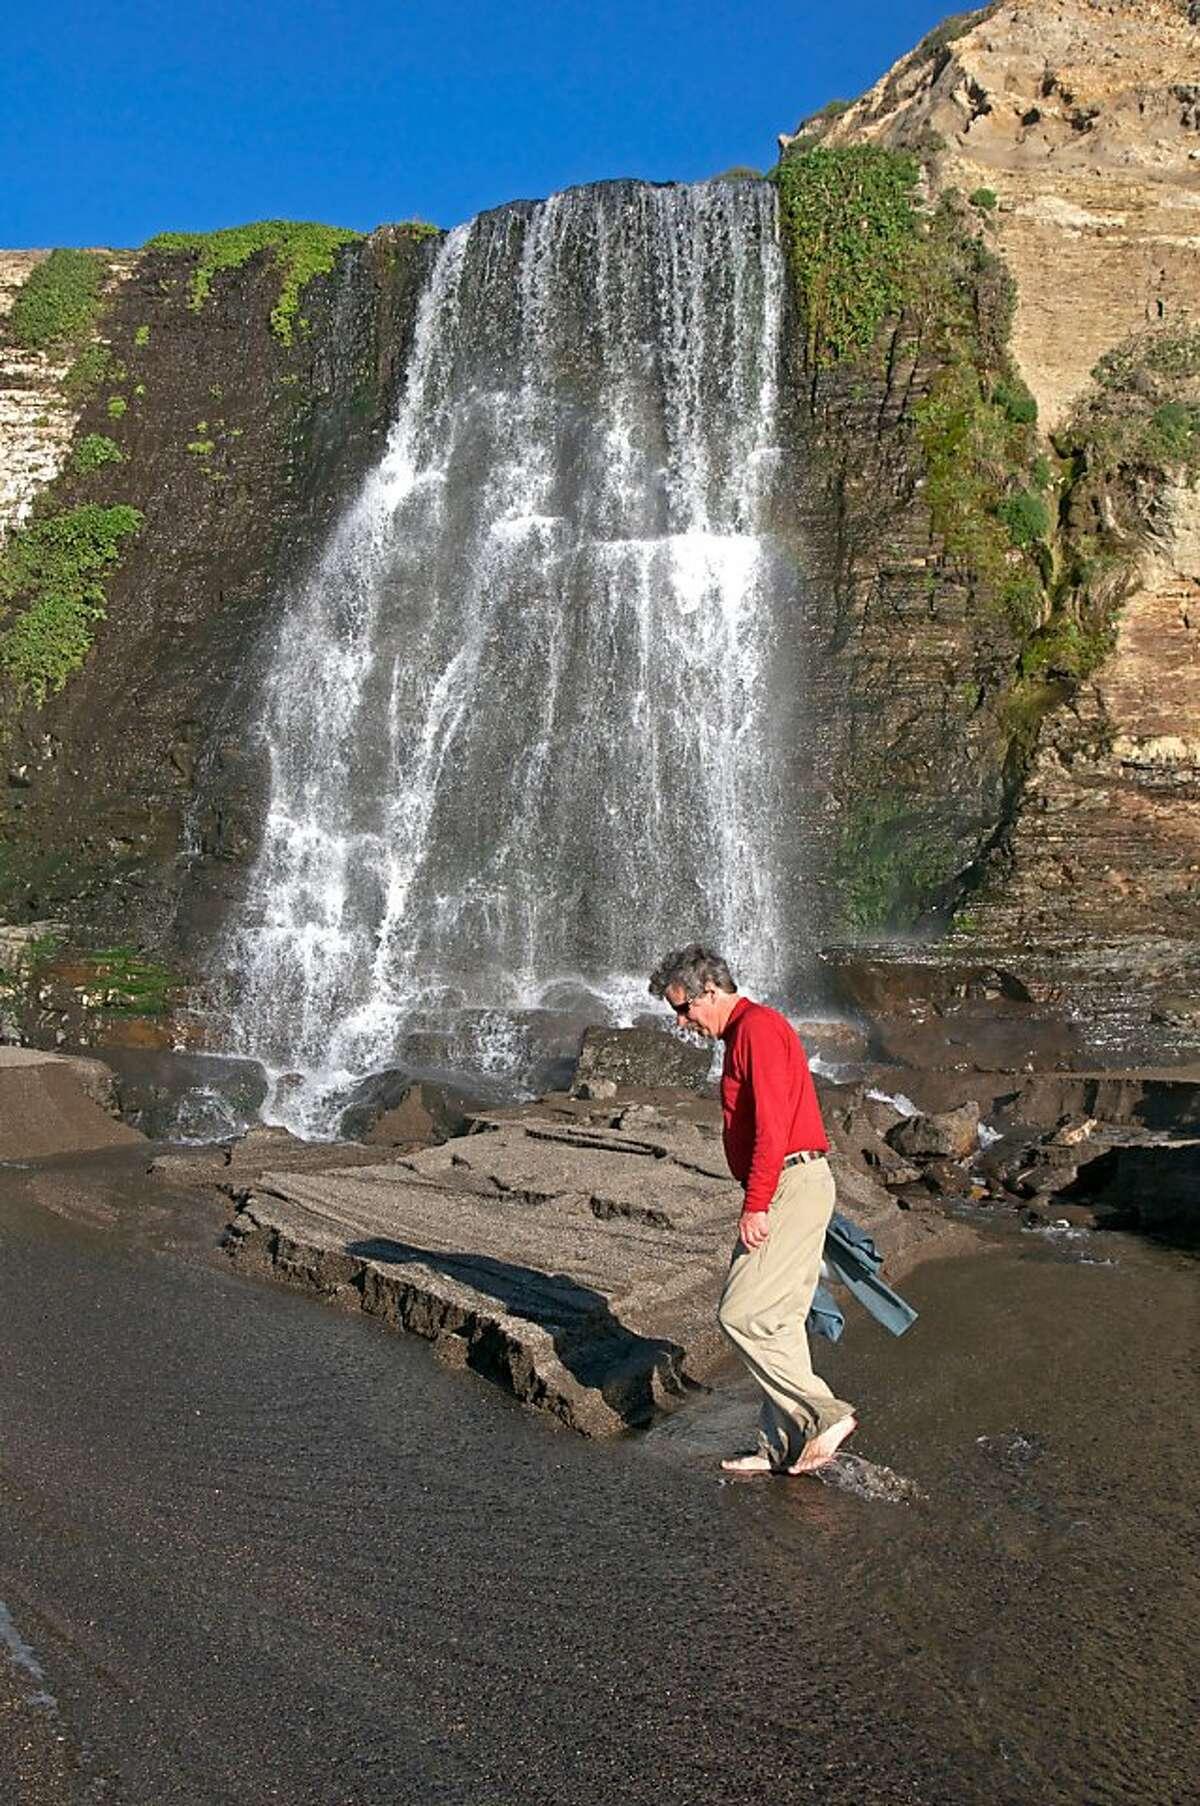 Kai Wiedman at Alamere Falls.